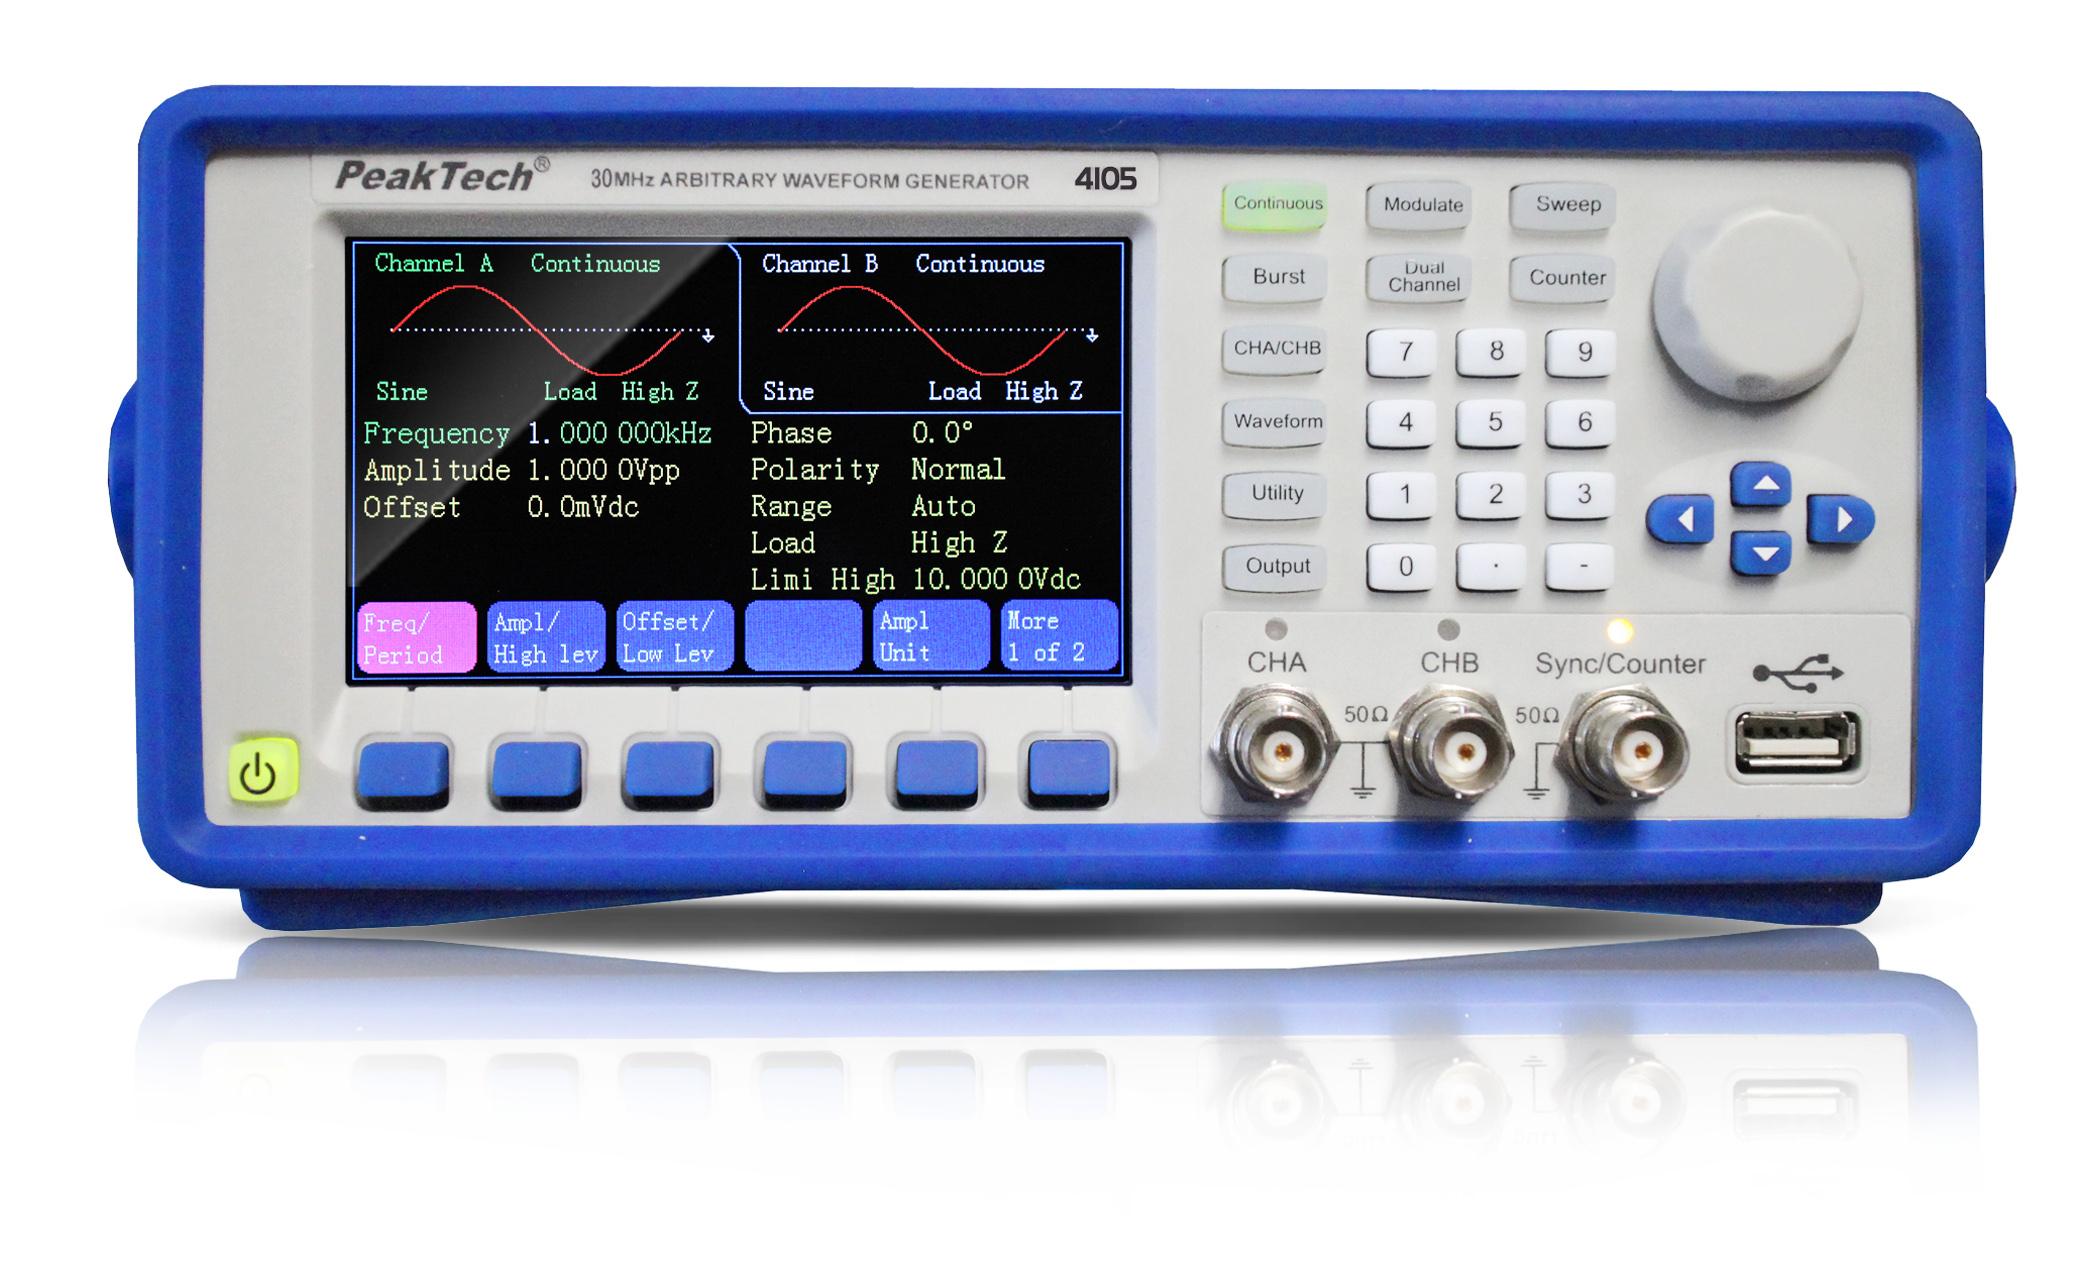 «PeakTech® P 4105» 2CH arbitrary function generator, 1 µHz - 30 MHz